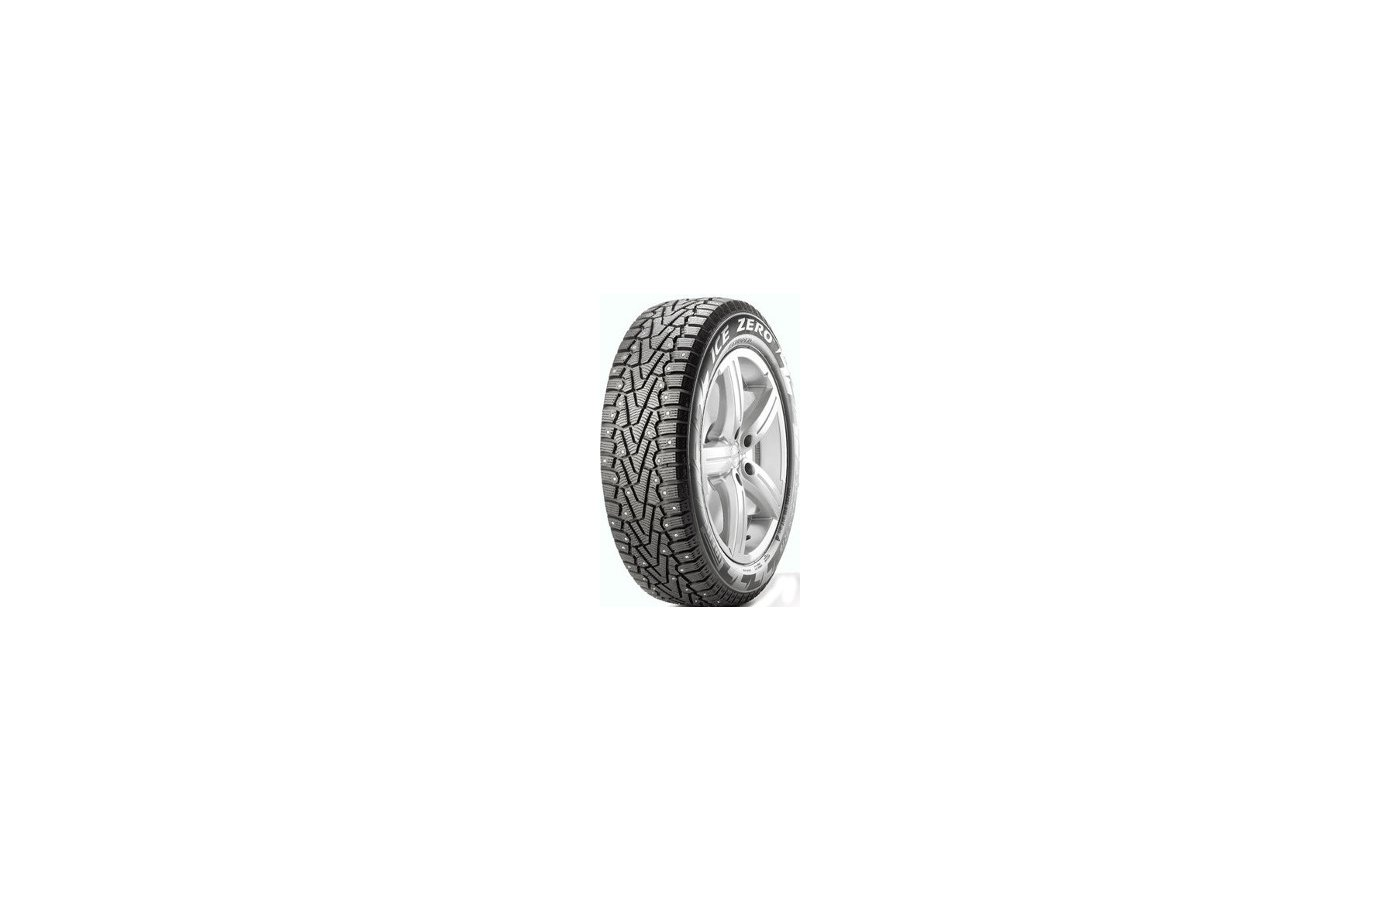 Шина Pirelli Winter Ice Zero 225/50 R17 TL 98T XL шип